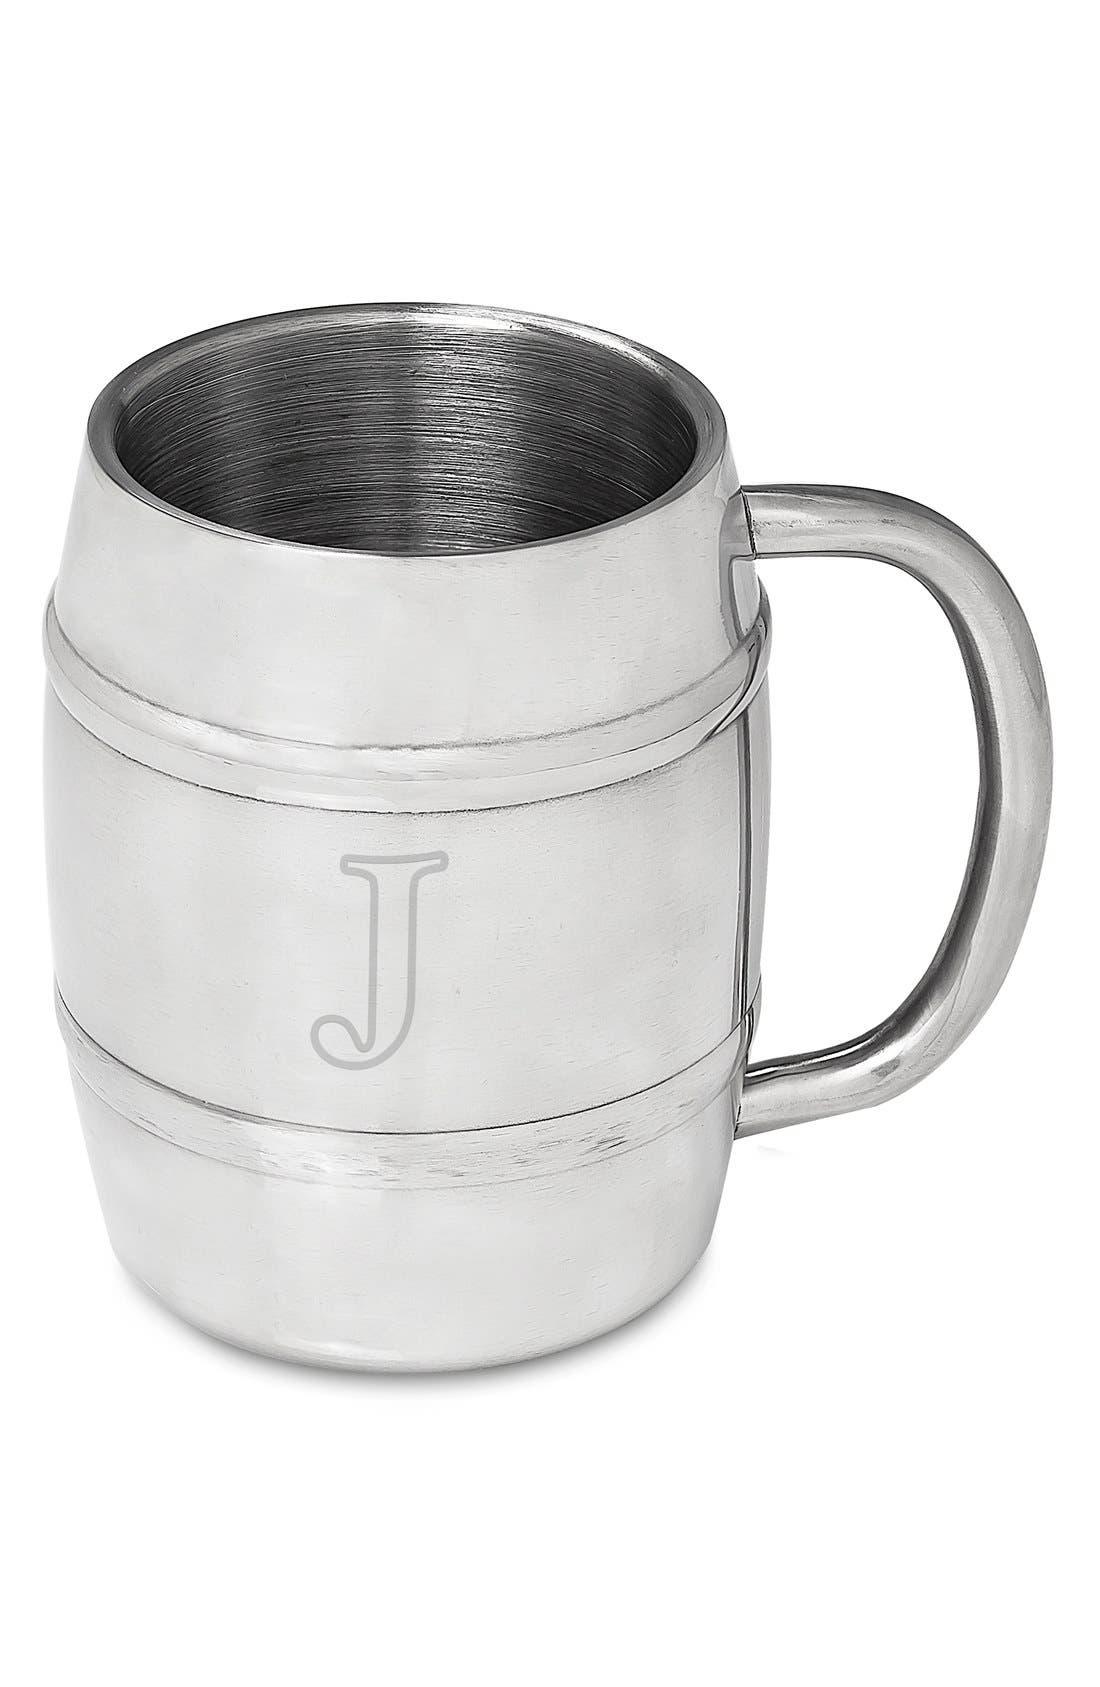 Monogram Stainless Steel Keg Mug,                             Main thumbnail 12, color,